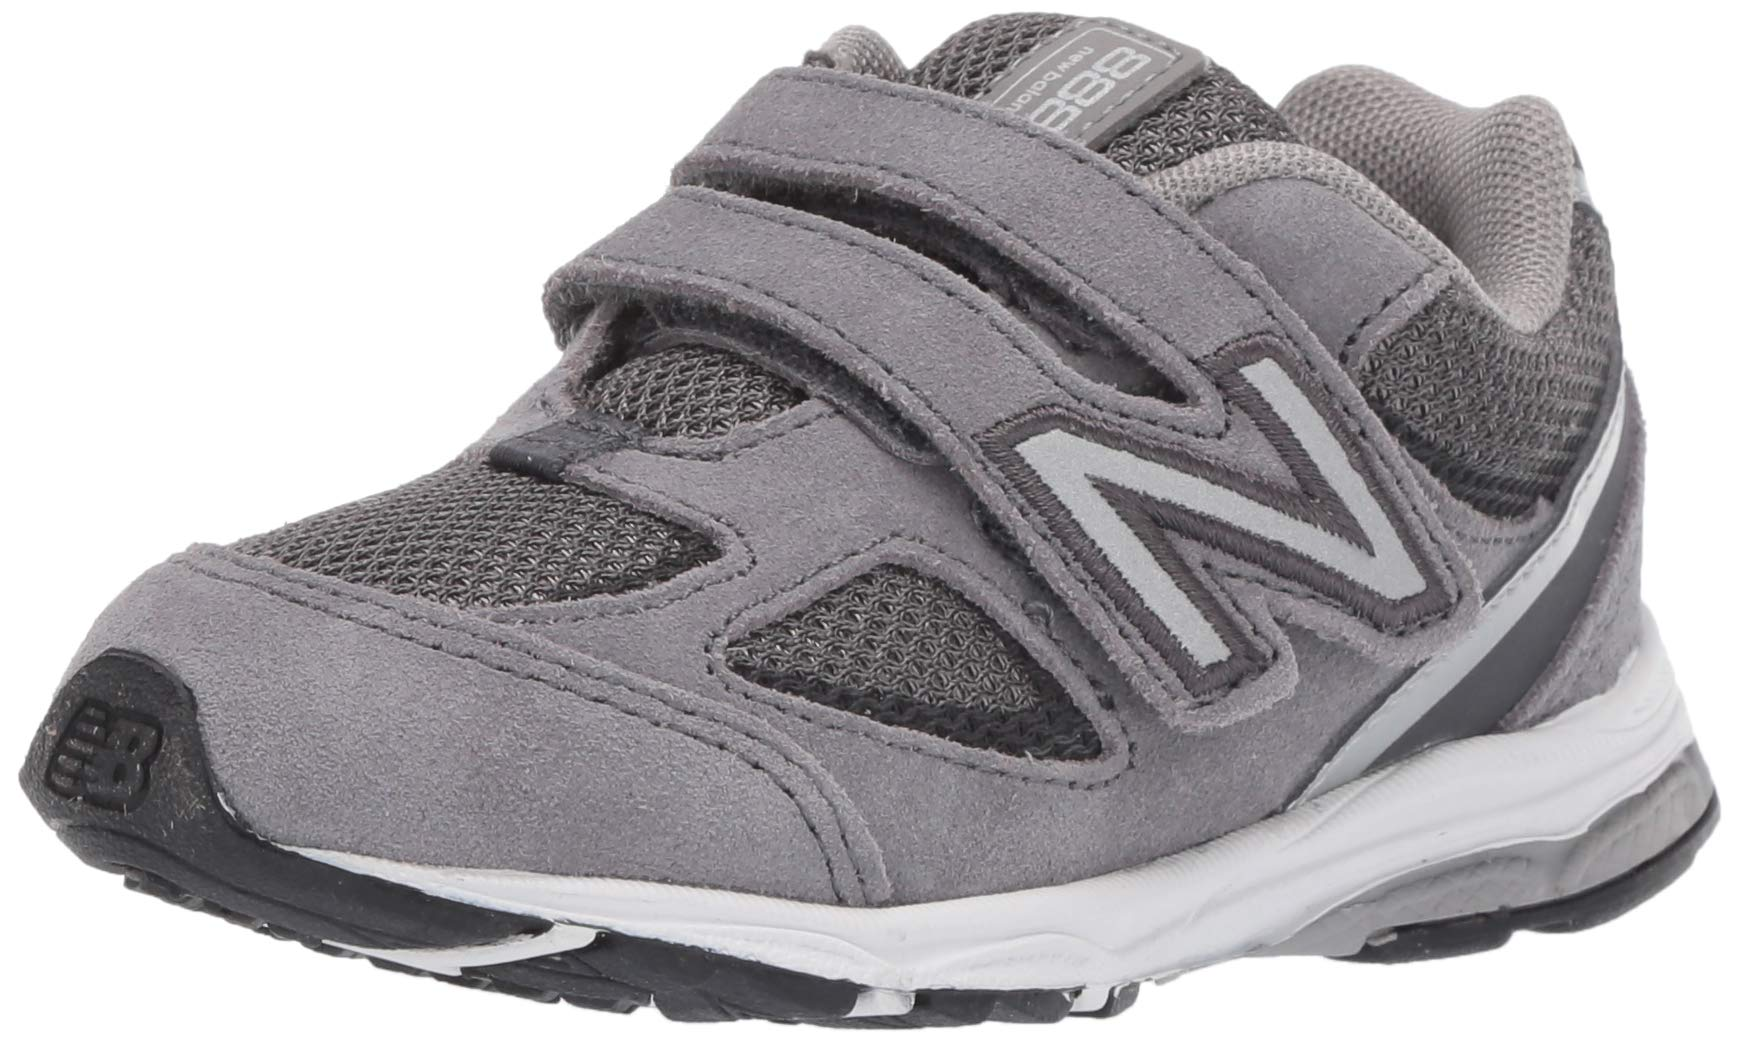 New Balance Boys' 888v2 Hook and Loop Running Shoe, Dark Grey, 7 M US Toddler by New Balance